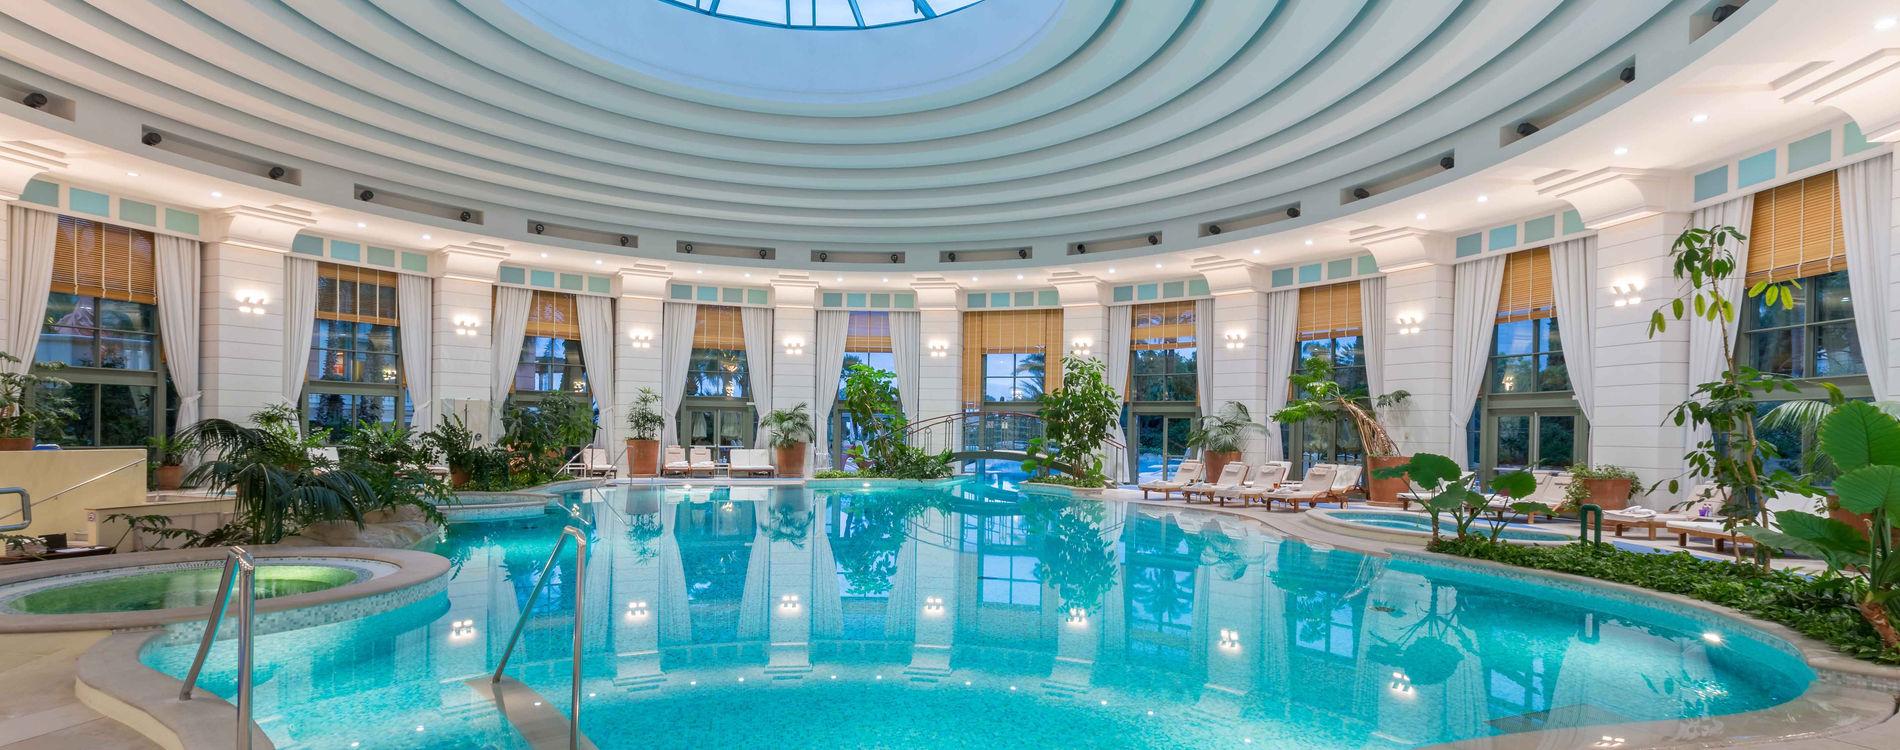 The Monte-Carlo Bay Hotel & Resort pool | Monte-Carlo